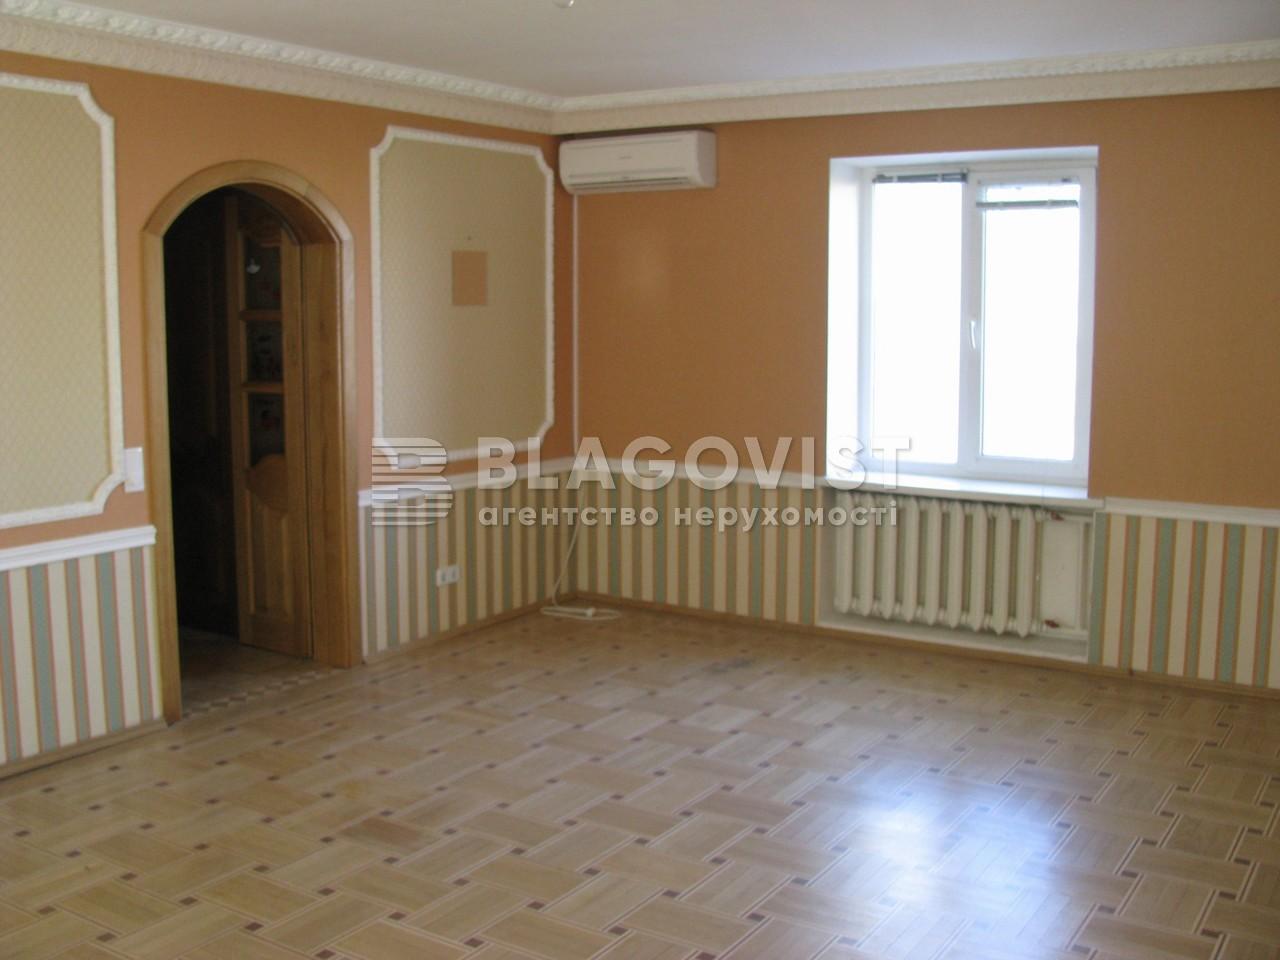 Квартира H-35926, Богатырская, 6/1, Киев - Фото 5